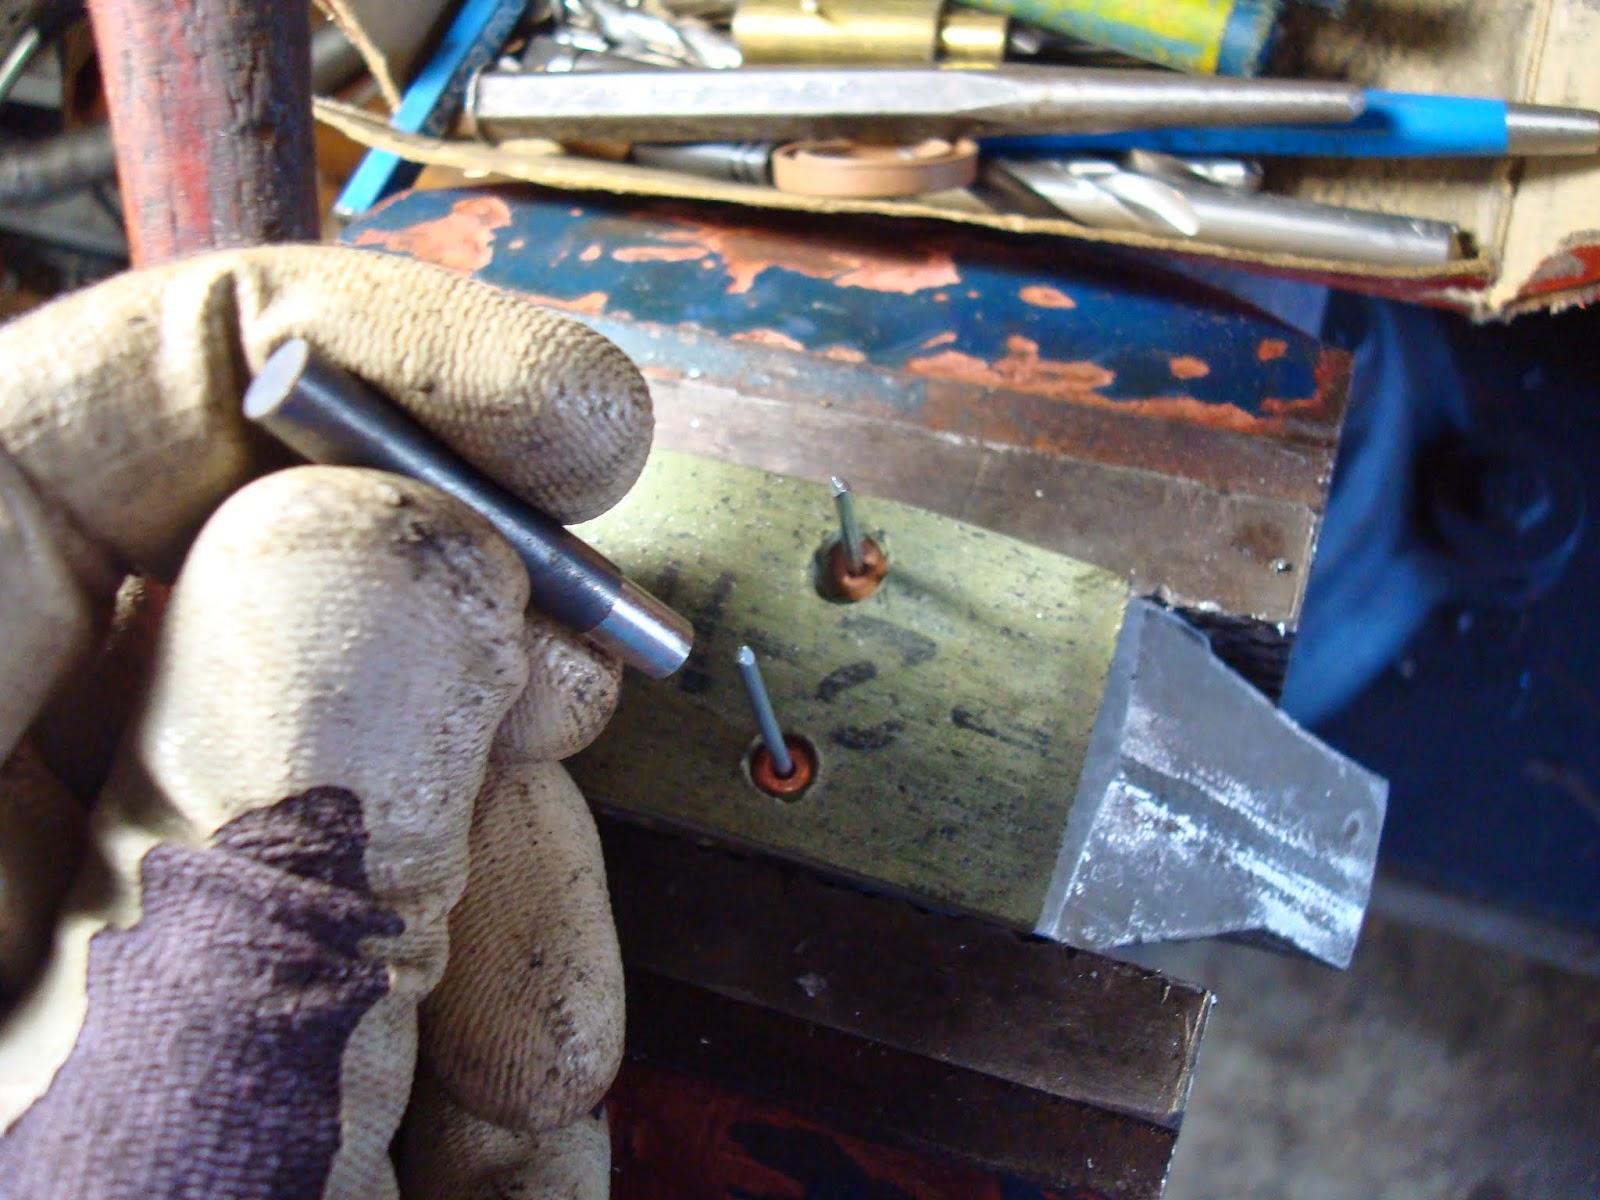 Brake Pad Riveting Tool : Scottie s workshop replacing brake shoe linings on a bmw